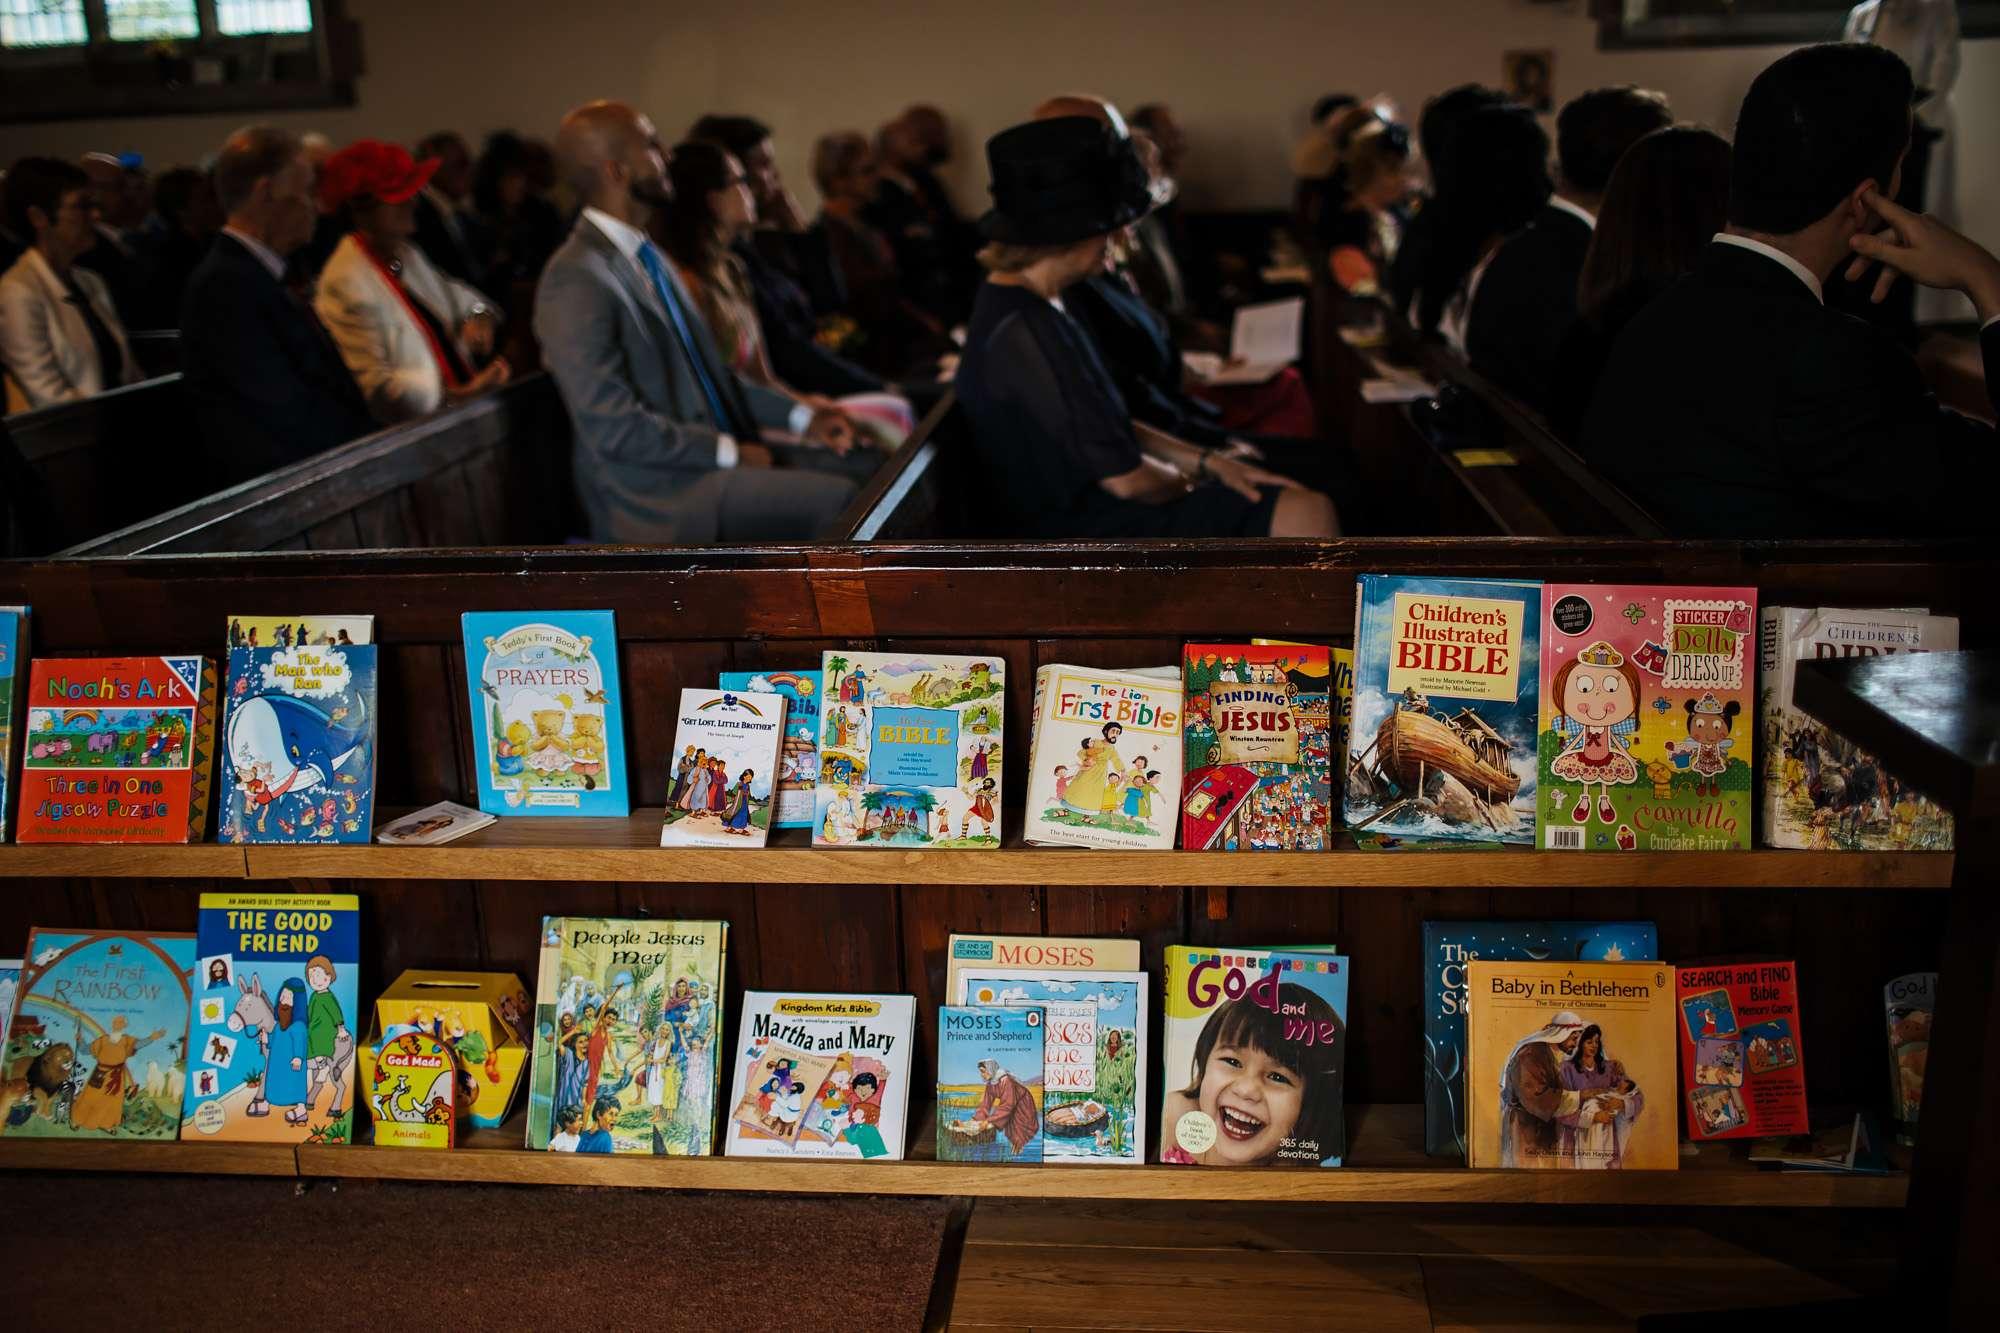 Colourful bookshelf at a Huddersfield church wedding